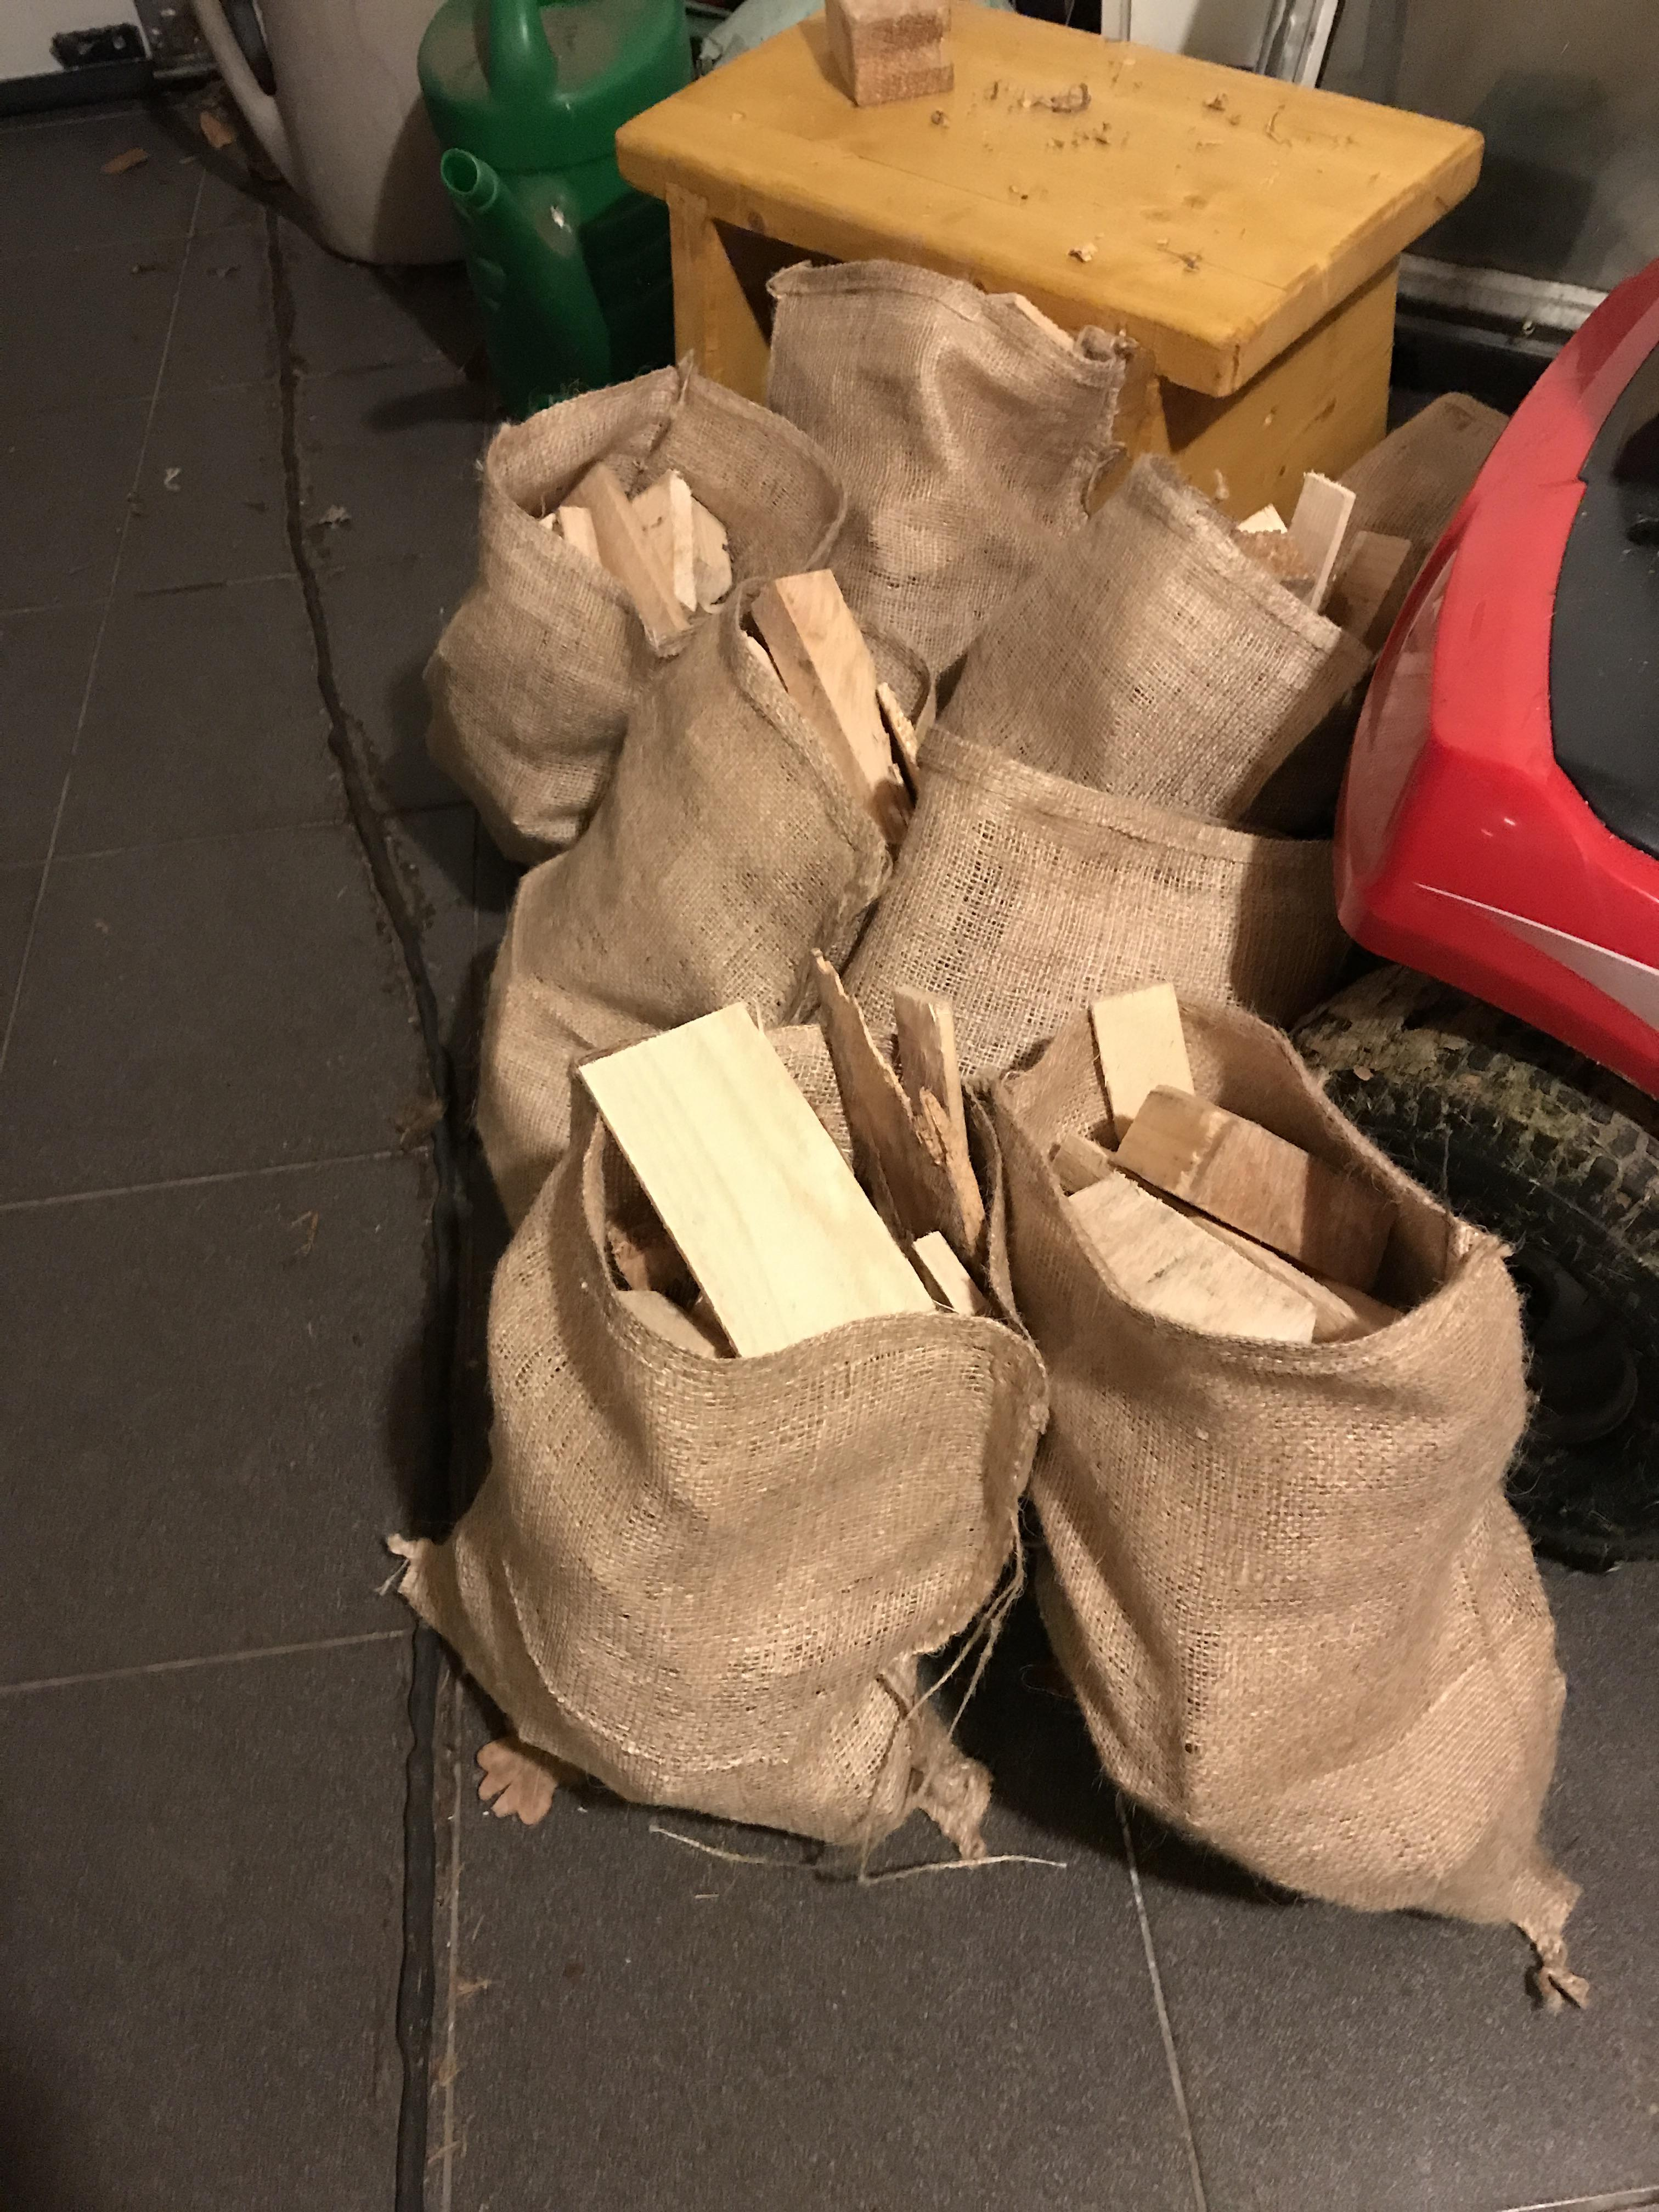 Jute zakken met sluitkoord 30 x 40 cm (per stuk) gebruik: Jute zakken met sluitkoord 30 x 40 cm (per stuk)